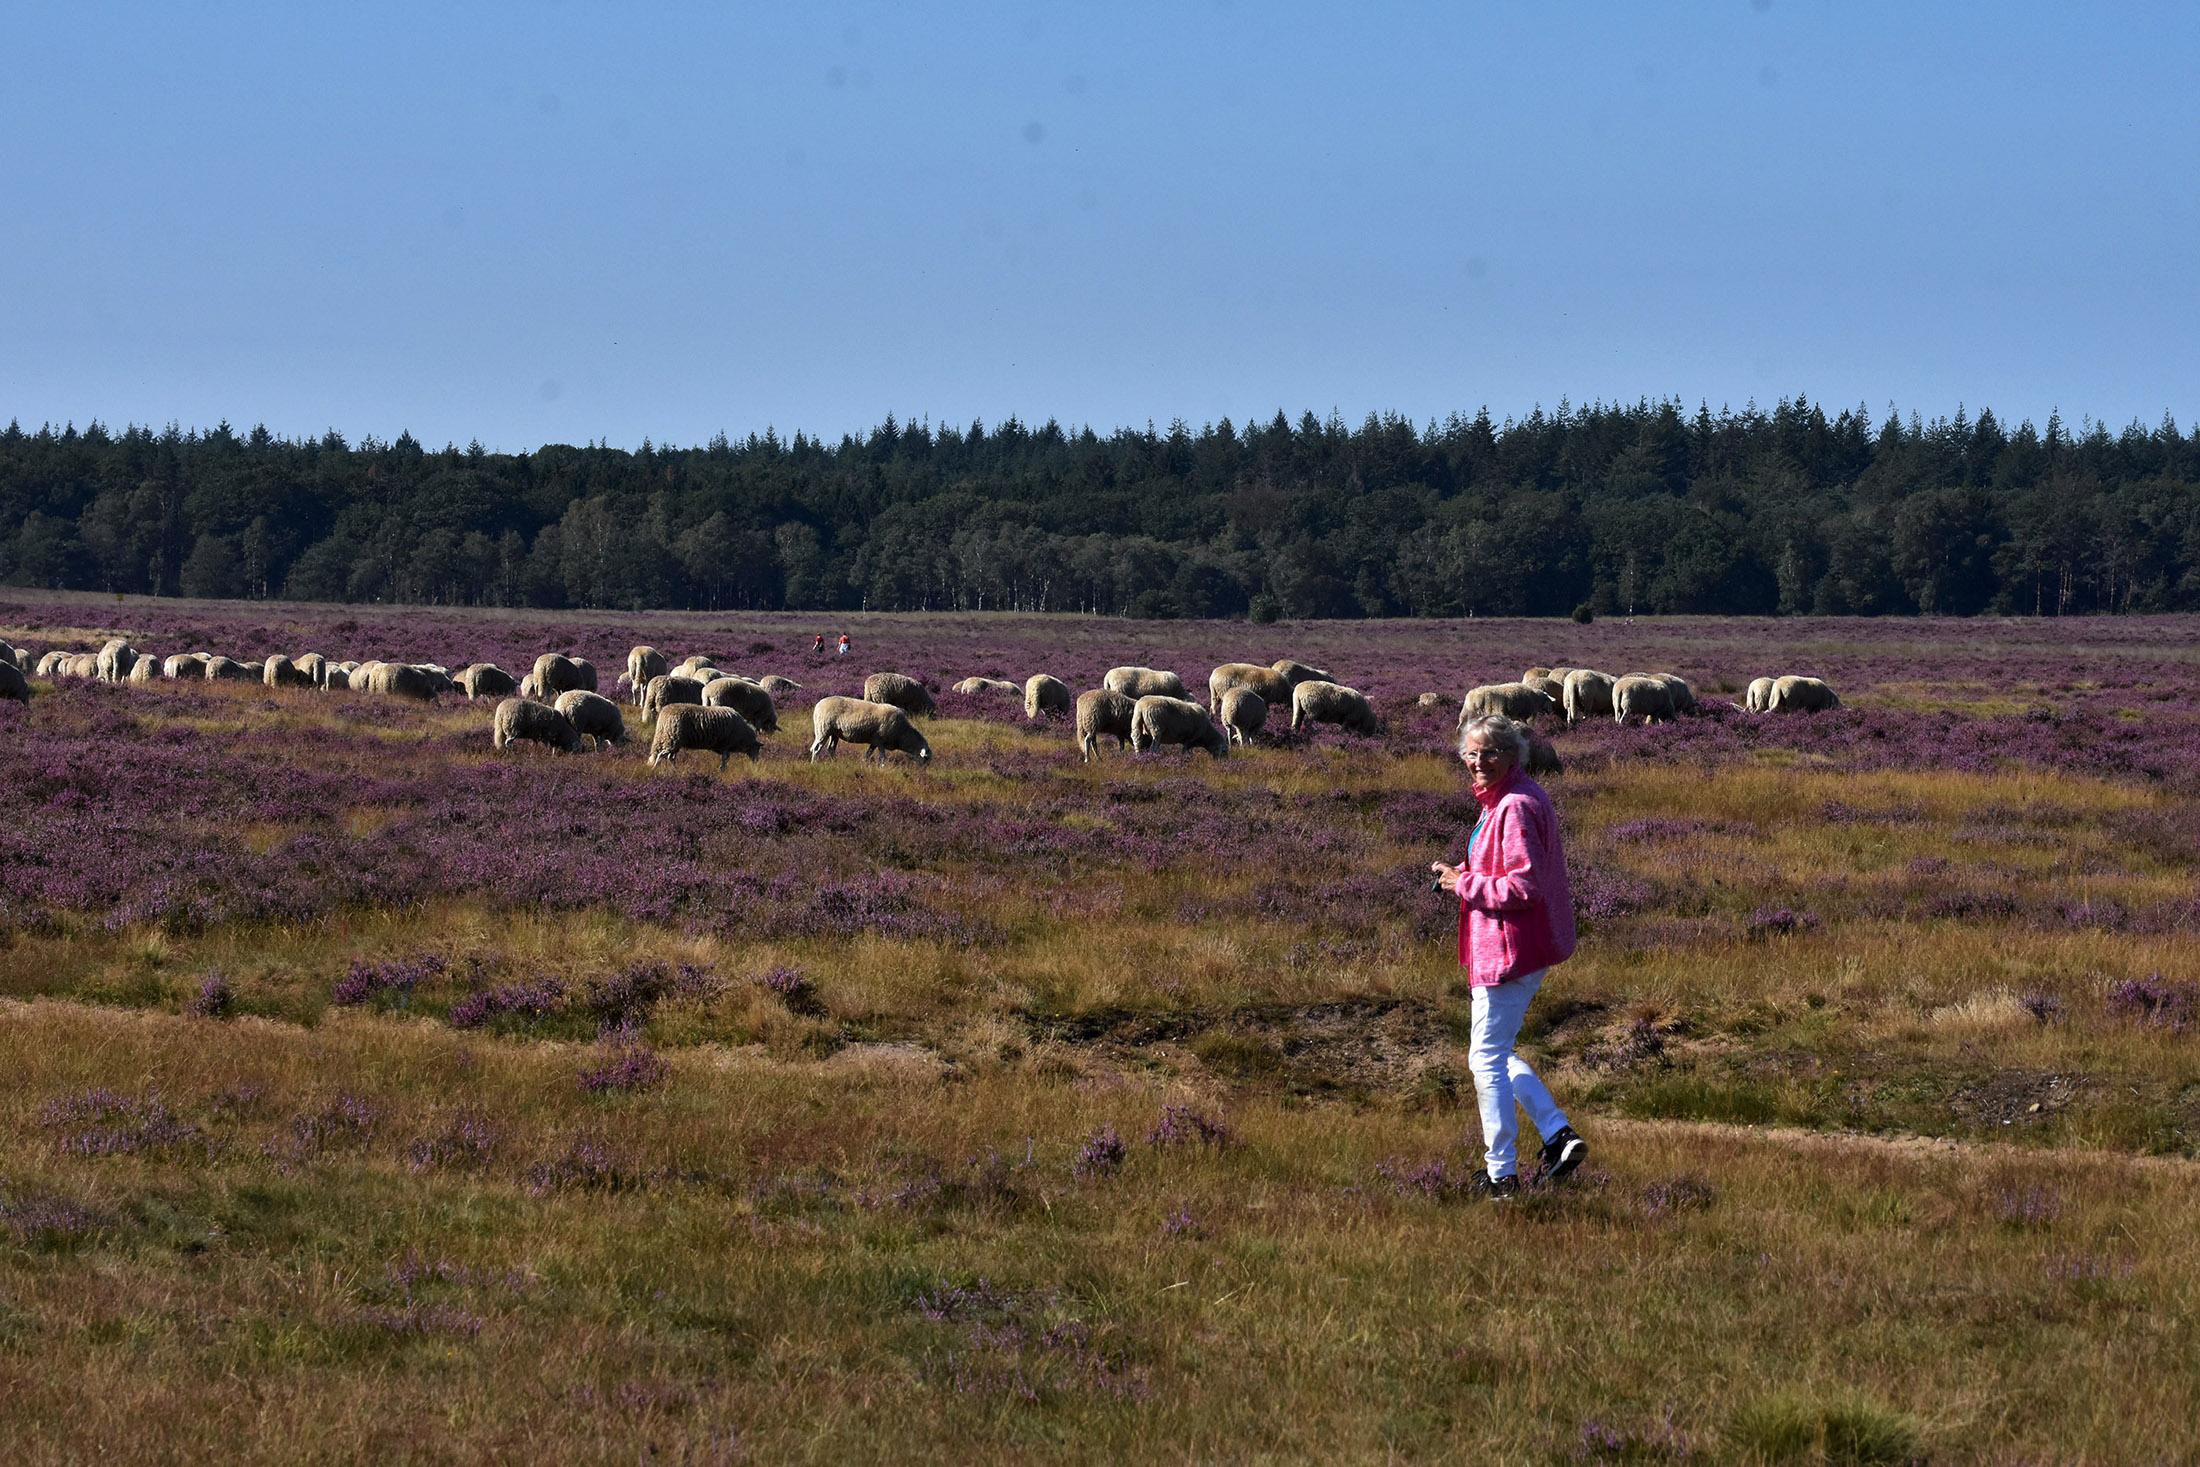 Fransien is helemaal weg van de witgewolde kudde in de paarse heide - Foto: ©Louis Fraanje